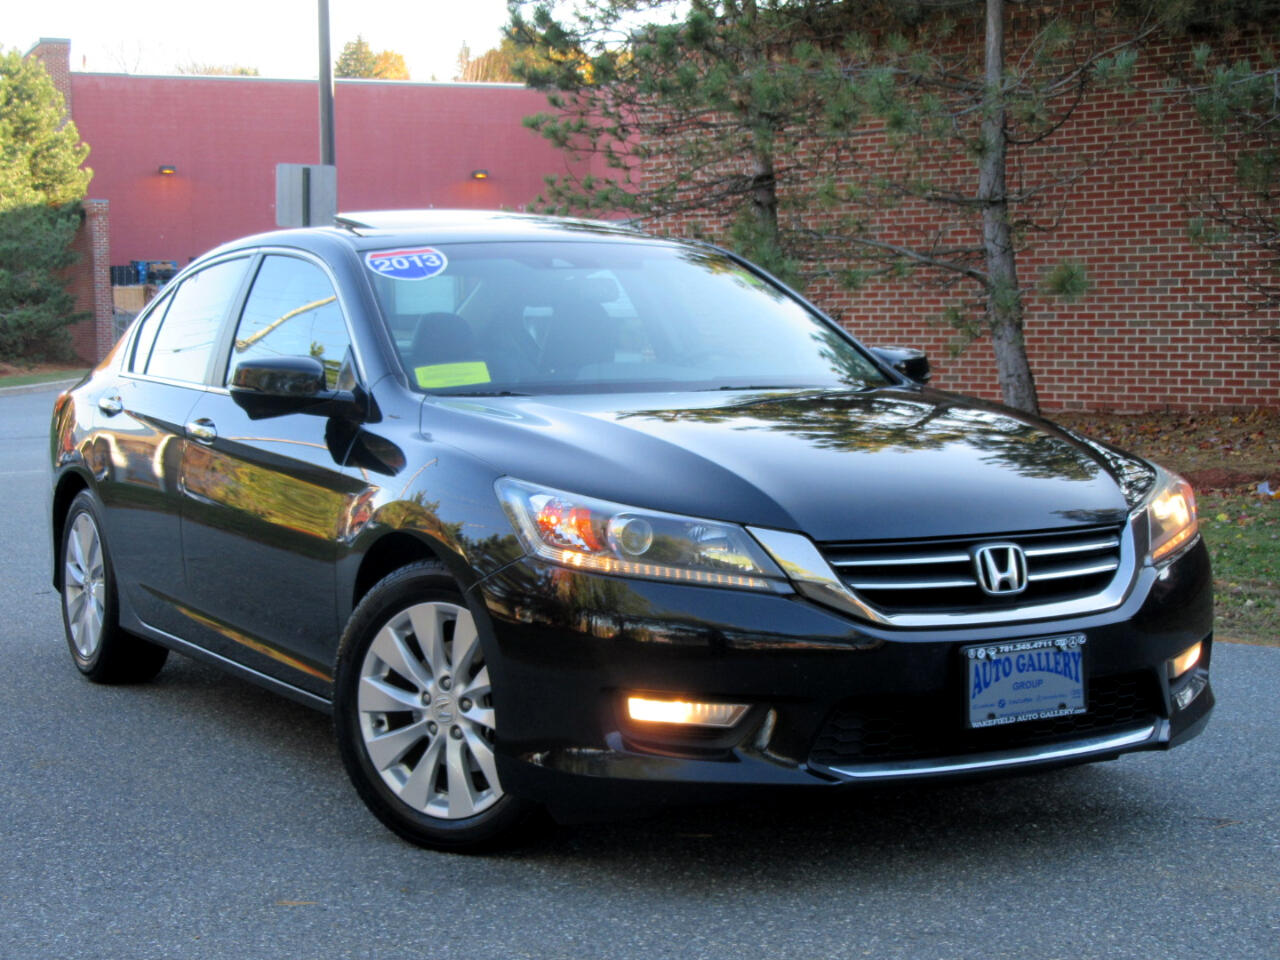 2013 Honda Accord Sdn 4dr I4 CVT EX-L LEATHER BACKUP CAMERA